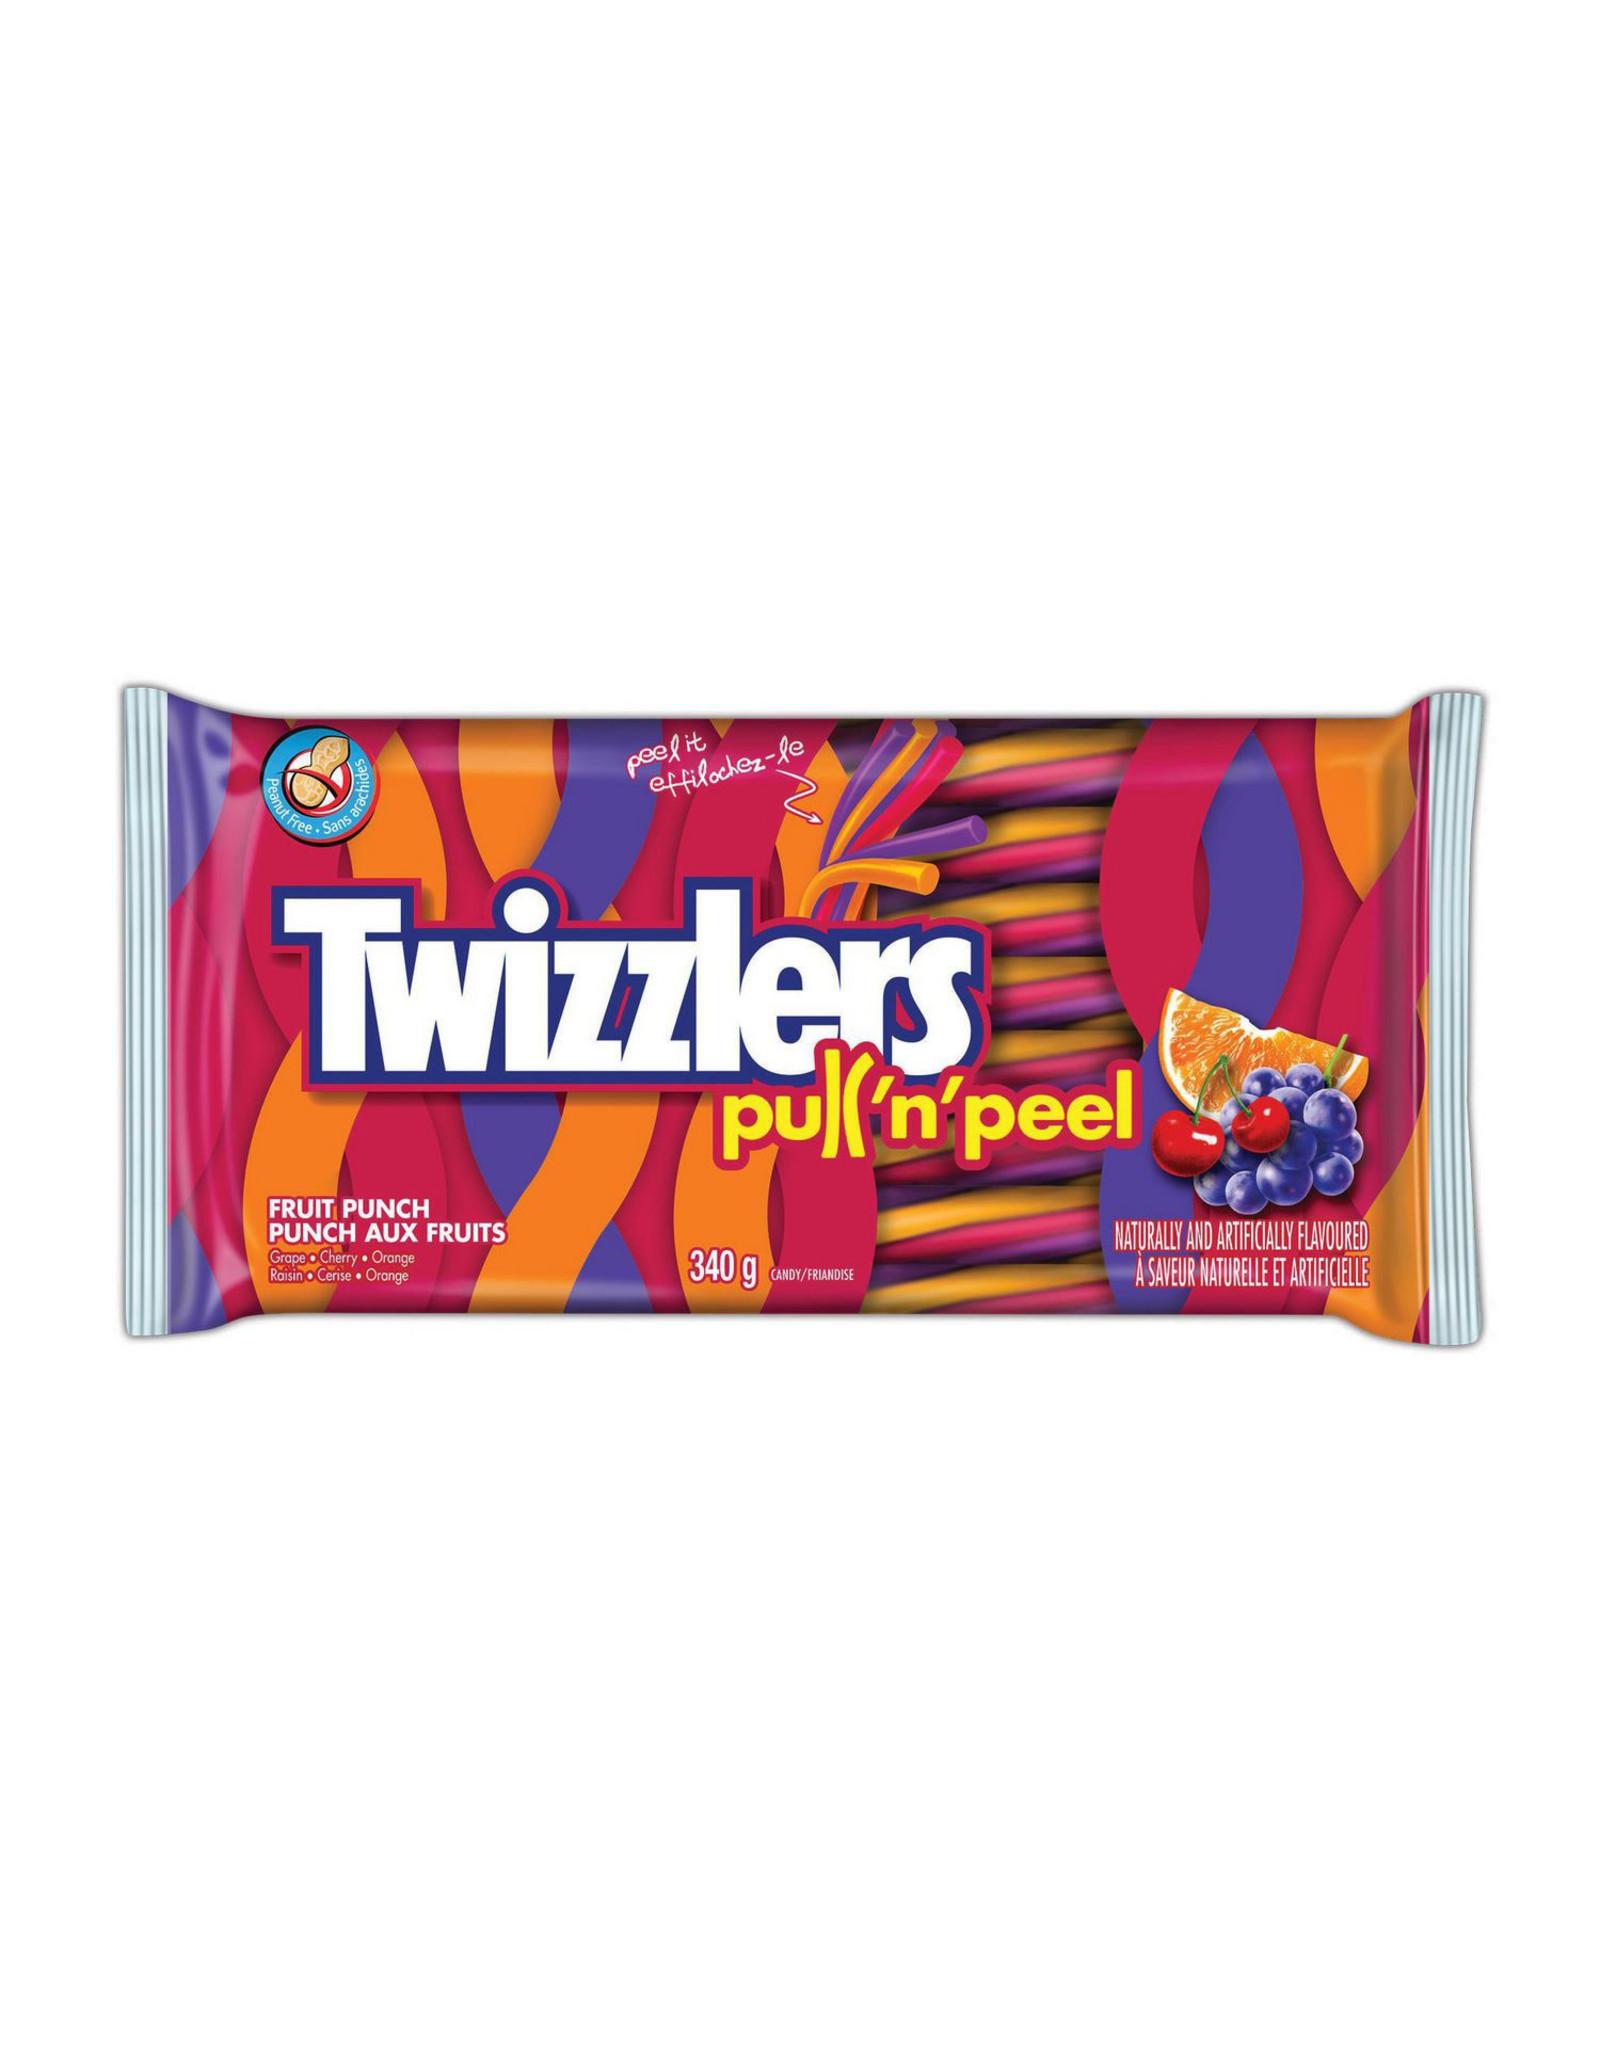 Twizzlers Pull 'n' Peel - Fruit Punch - LARGE - 340g